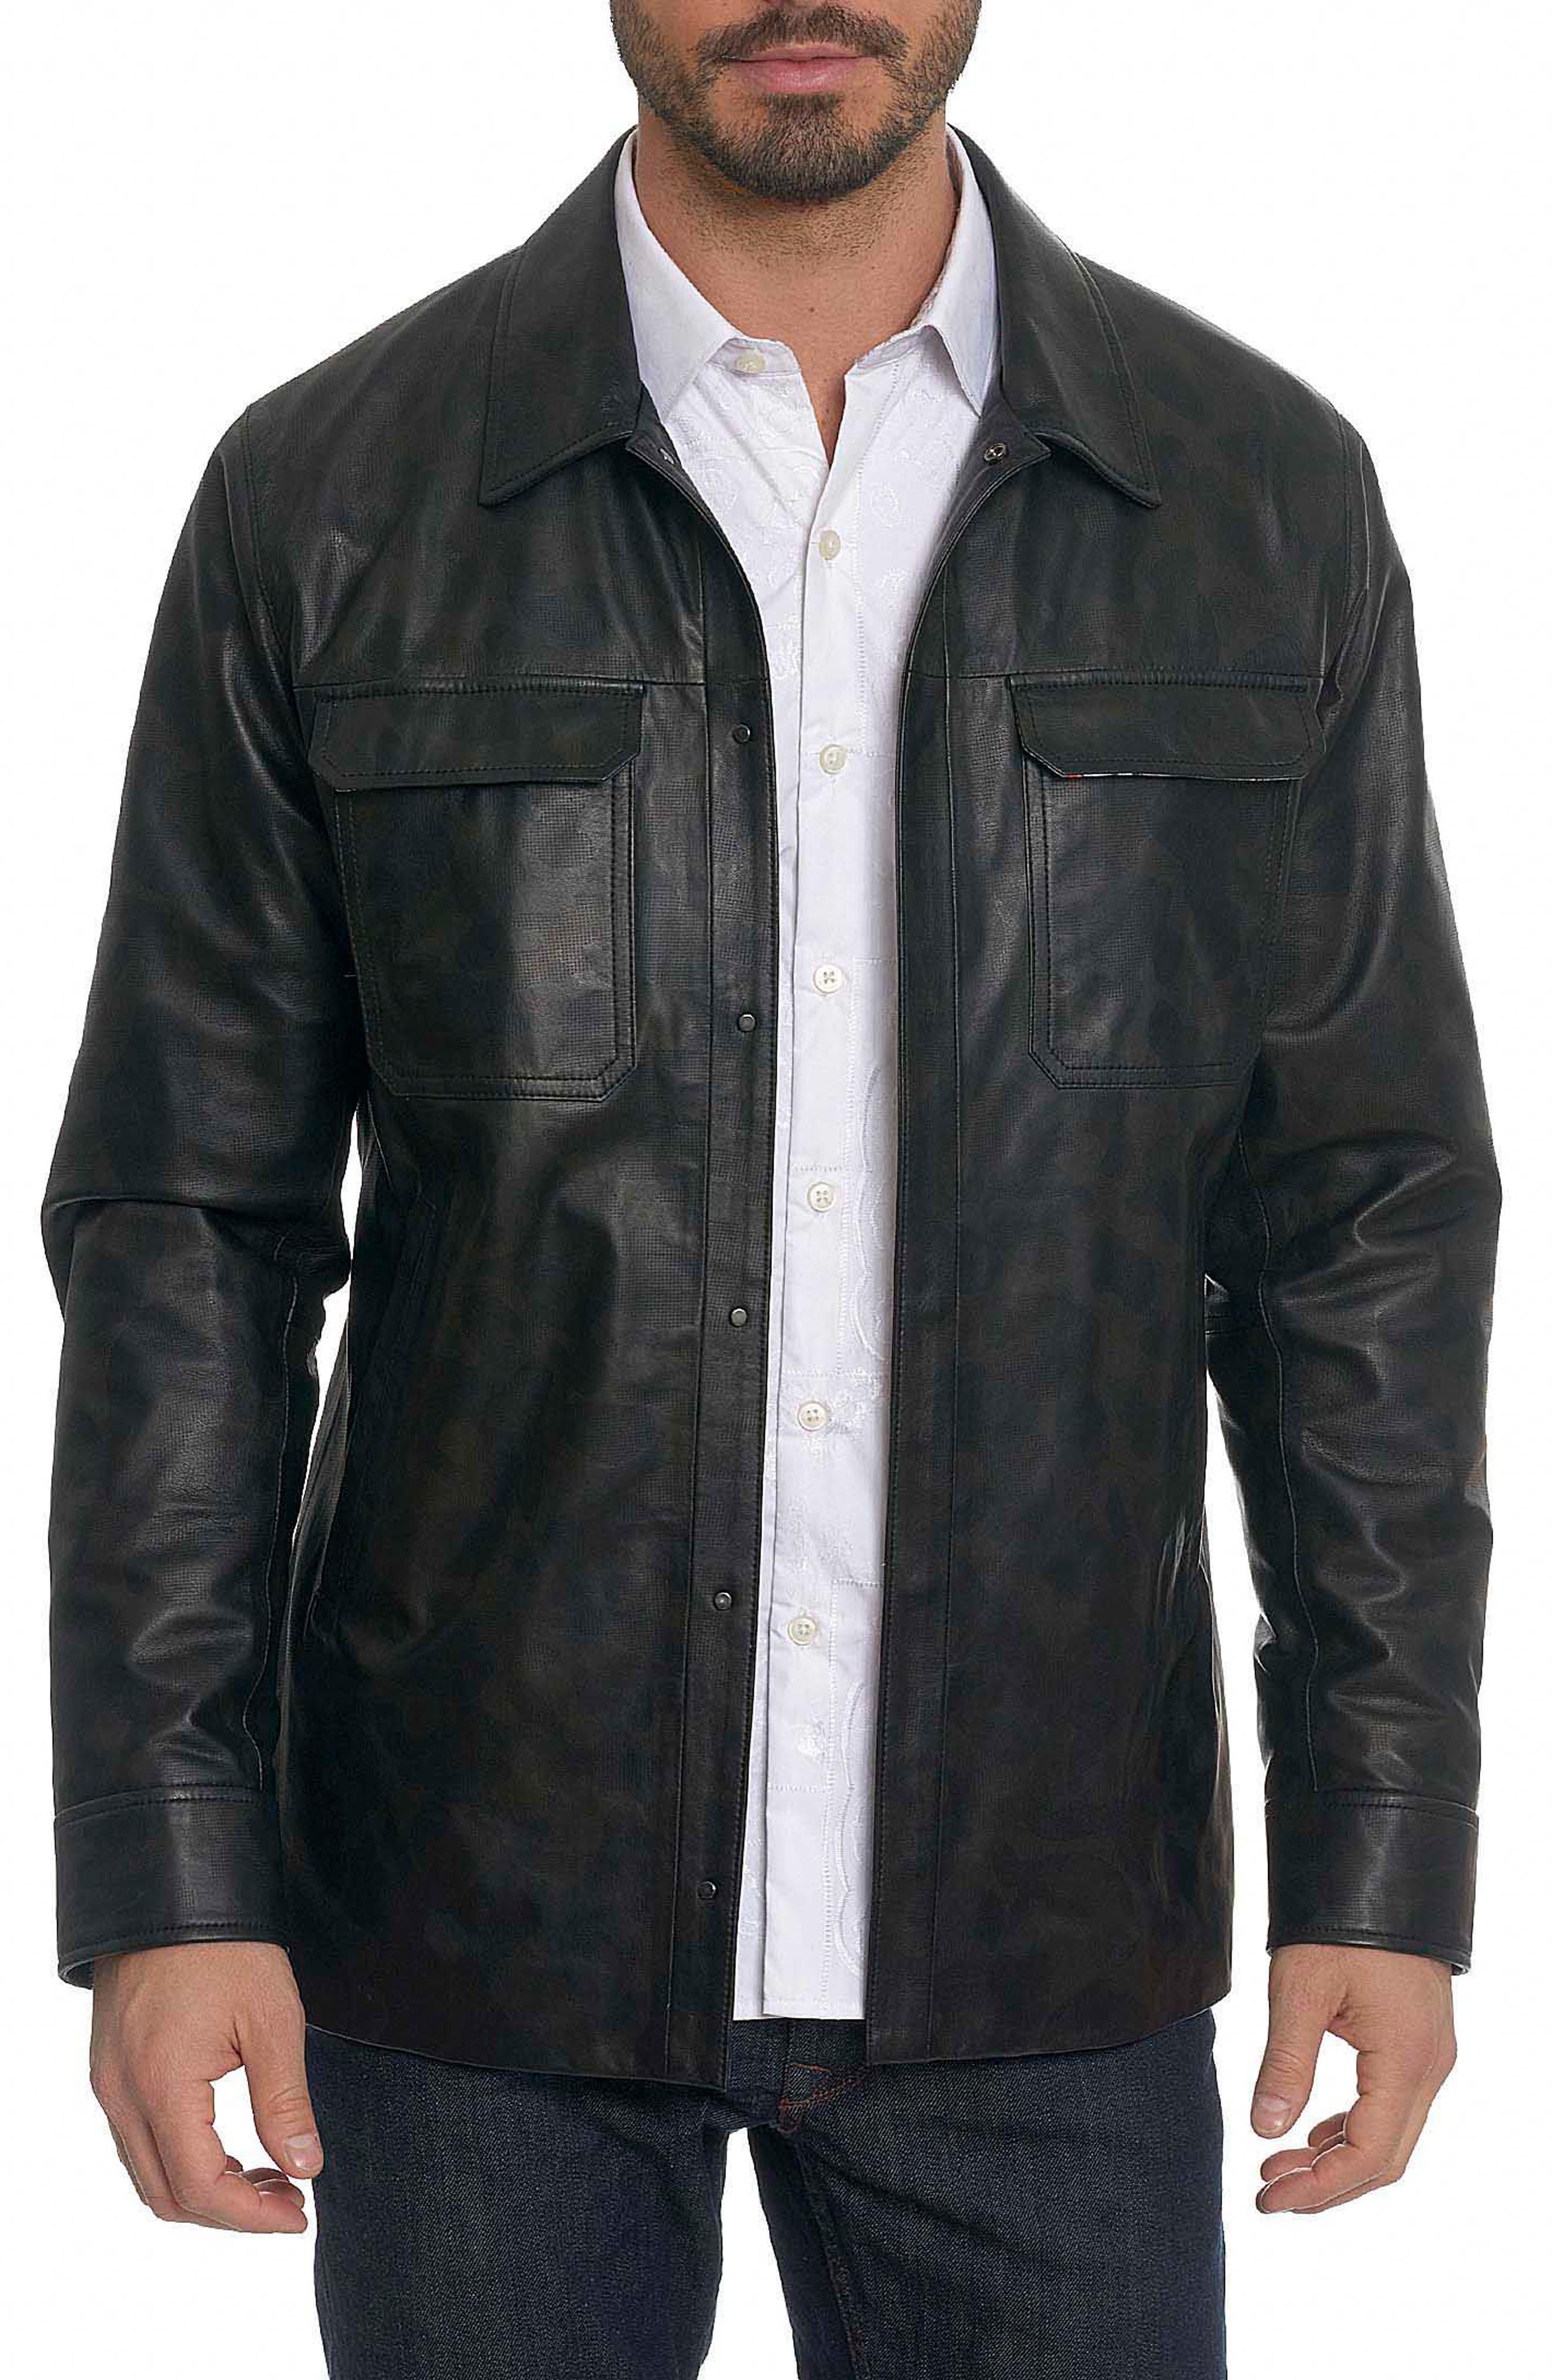 Colden Camo Leather Shirt Jacket,                             Main thumbnail 1, color,                             001